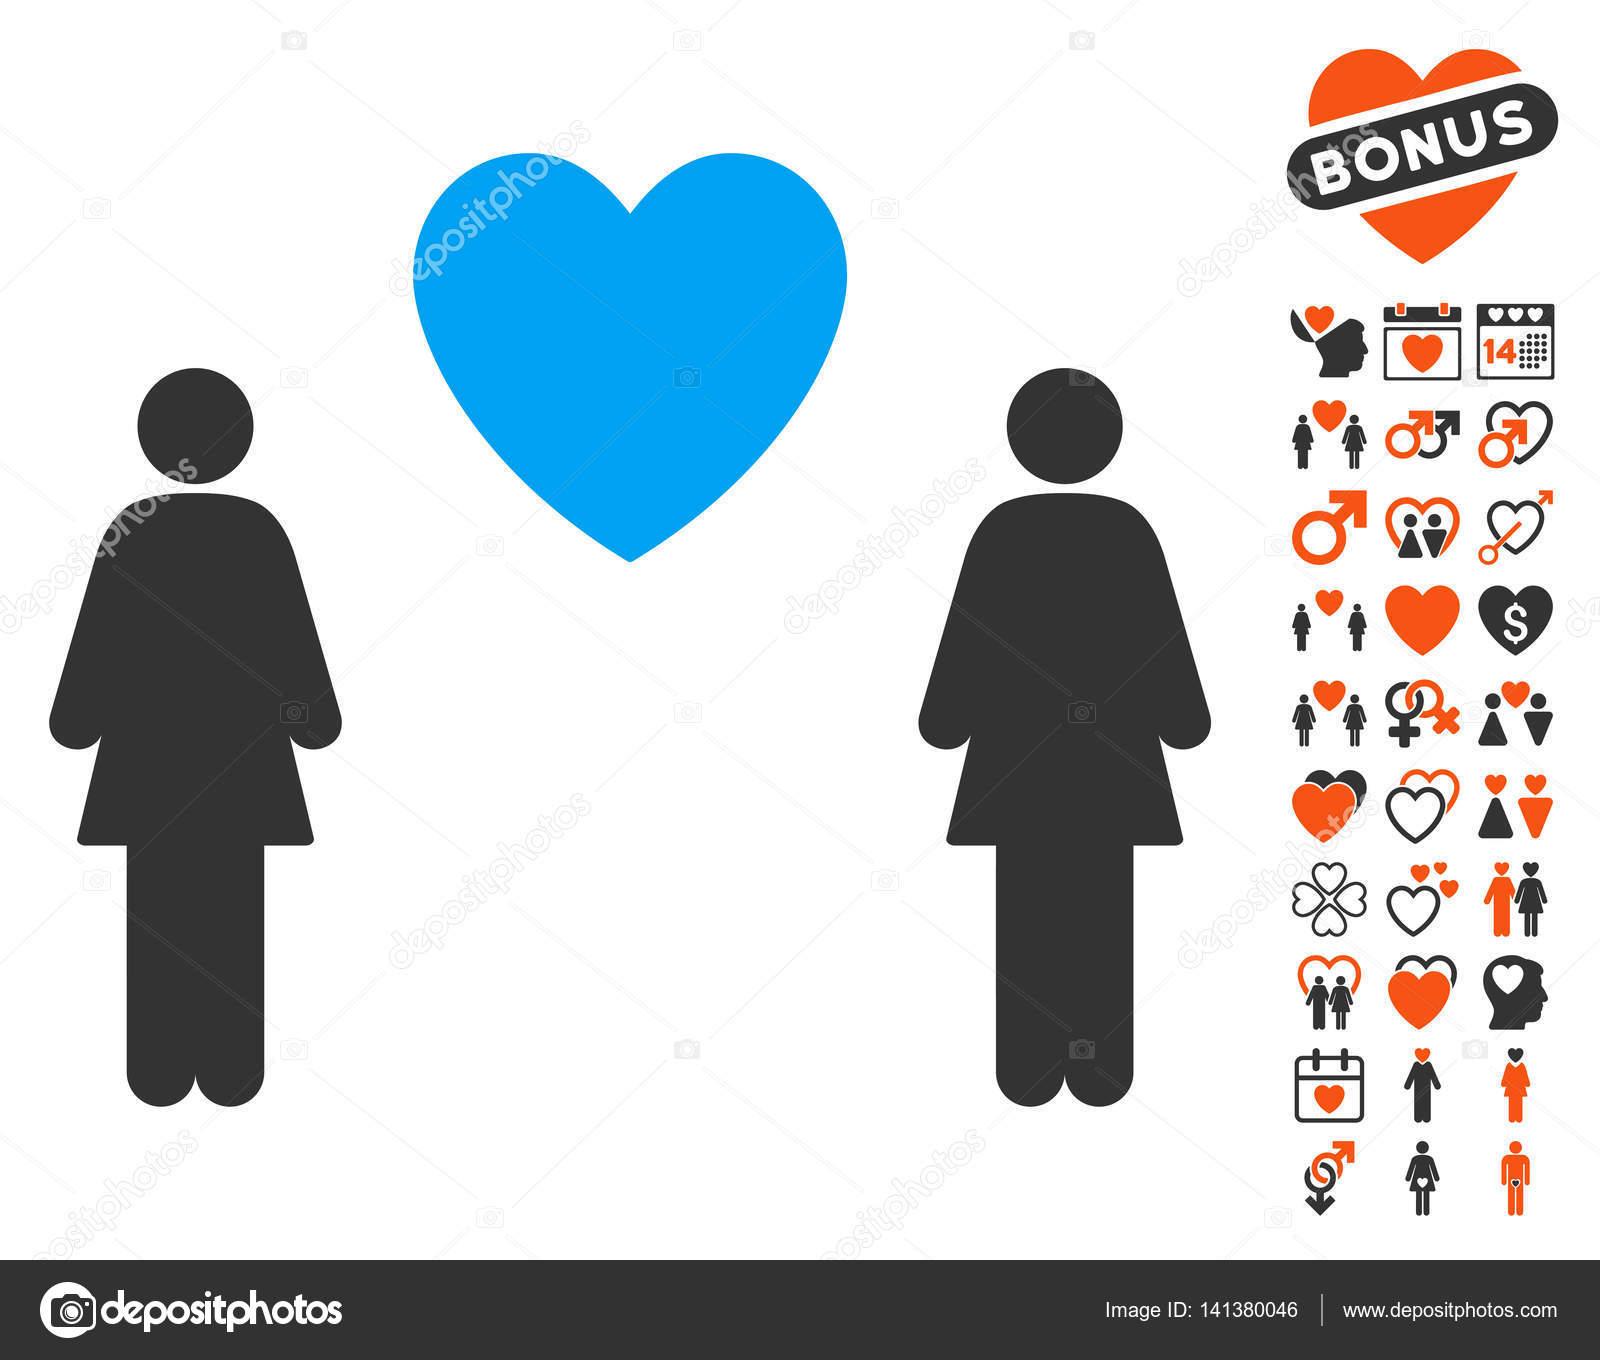 Gender identity symbols for homosexuality and heterosexuality lesbi love pair icon with love bonus buycottarizona